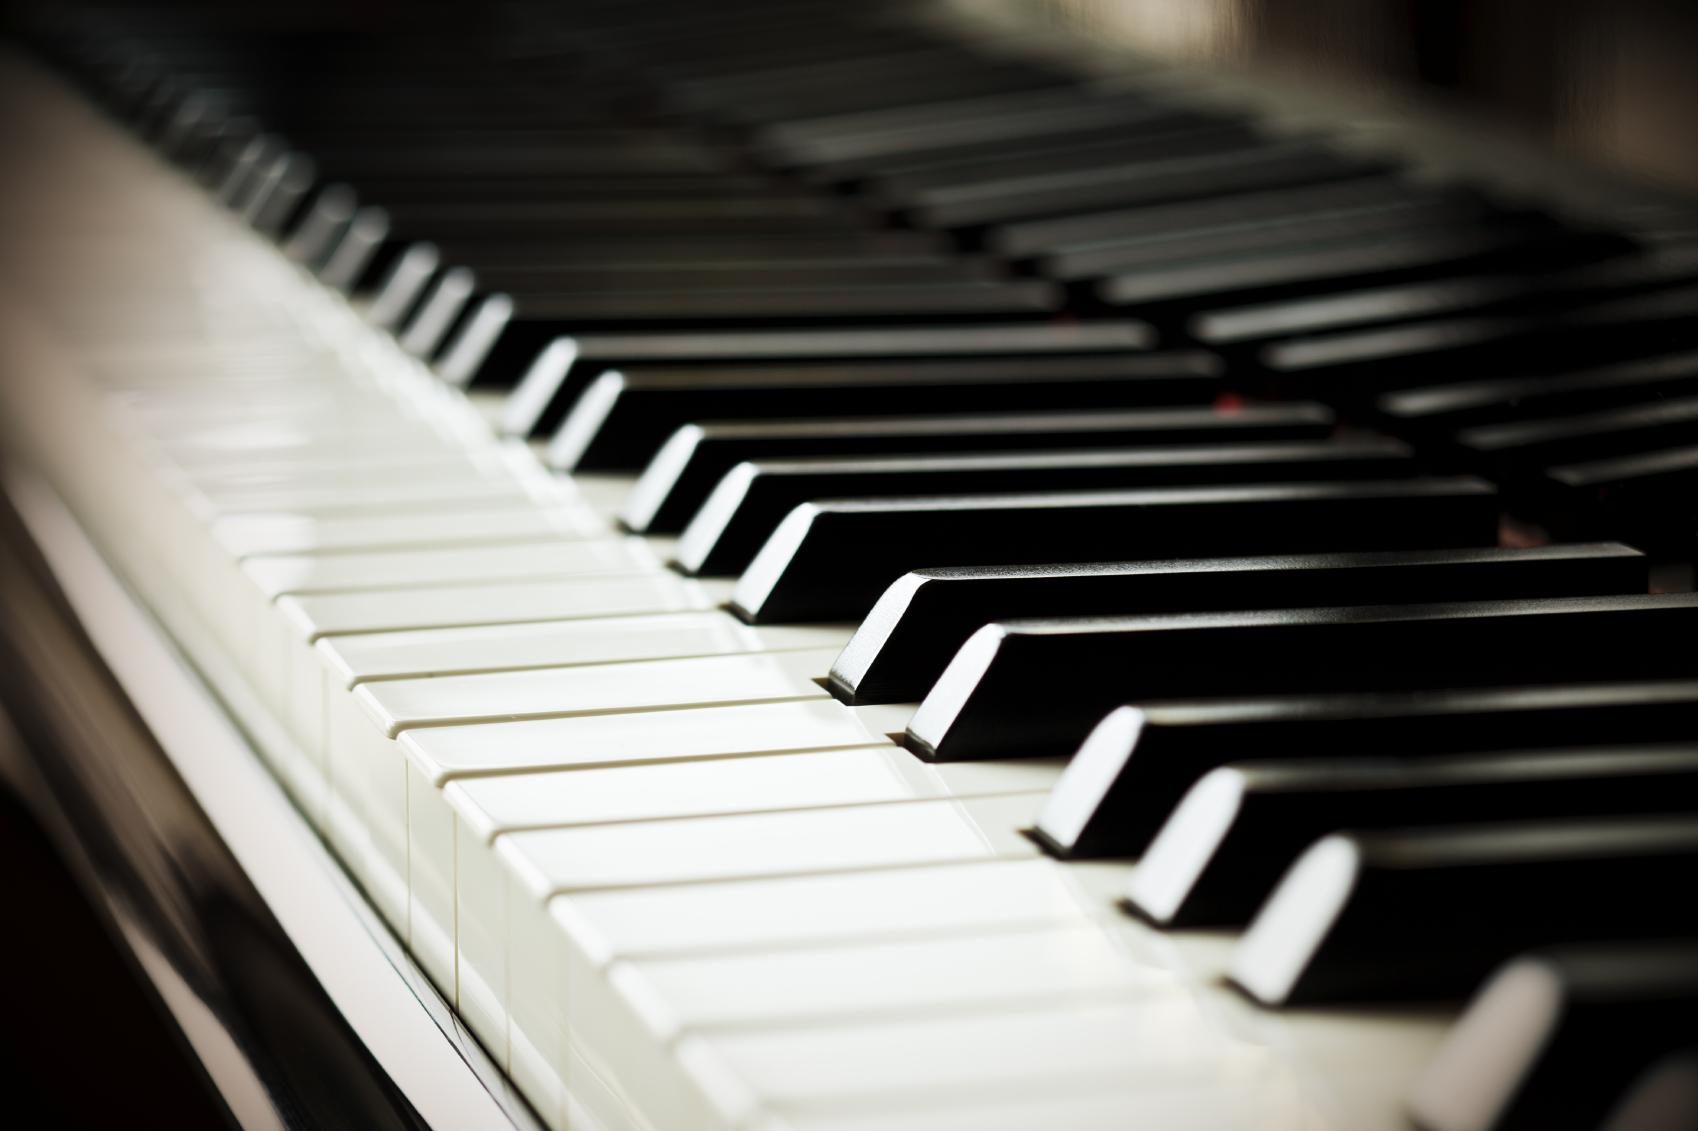 Fenton Chiropractor Piano